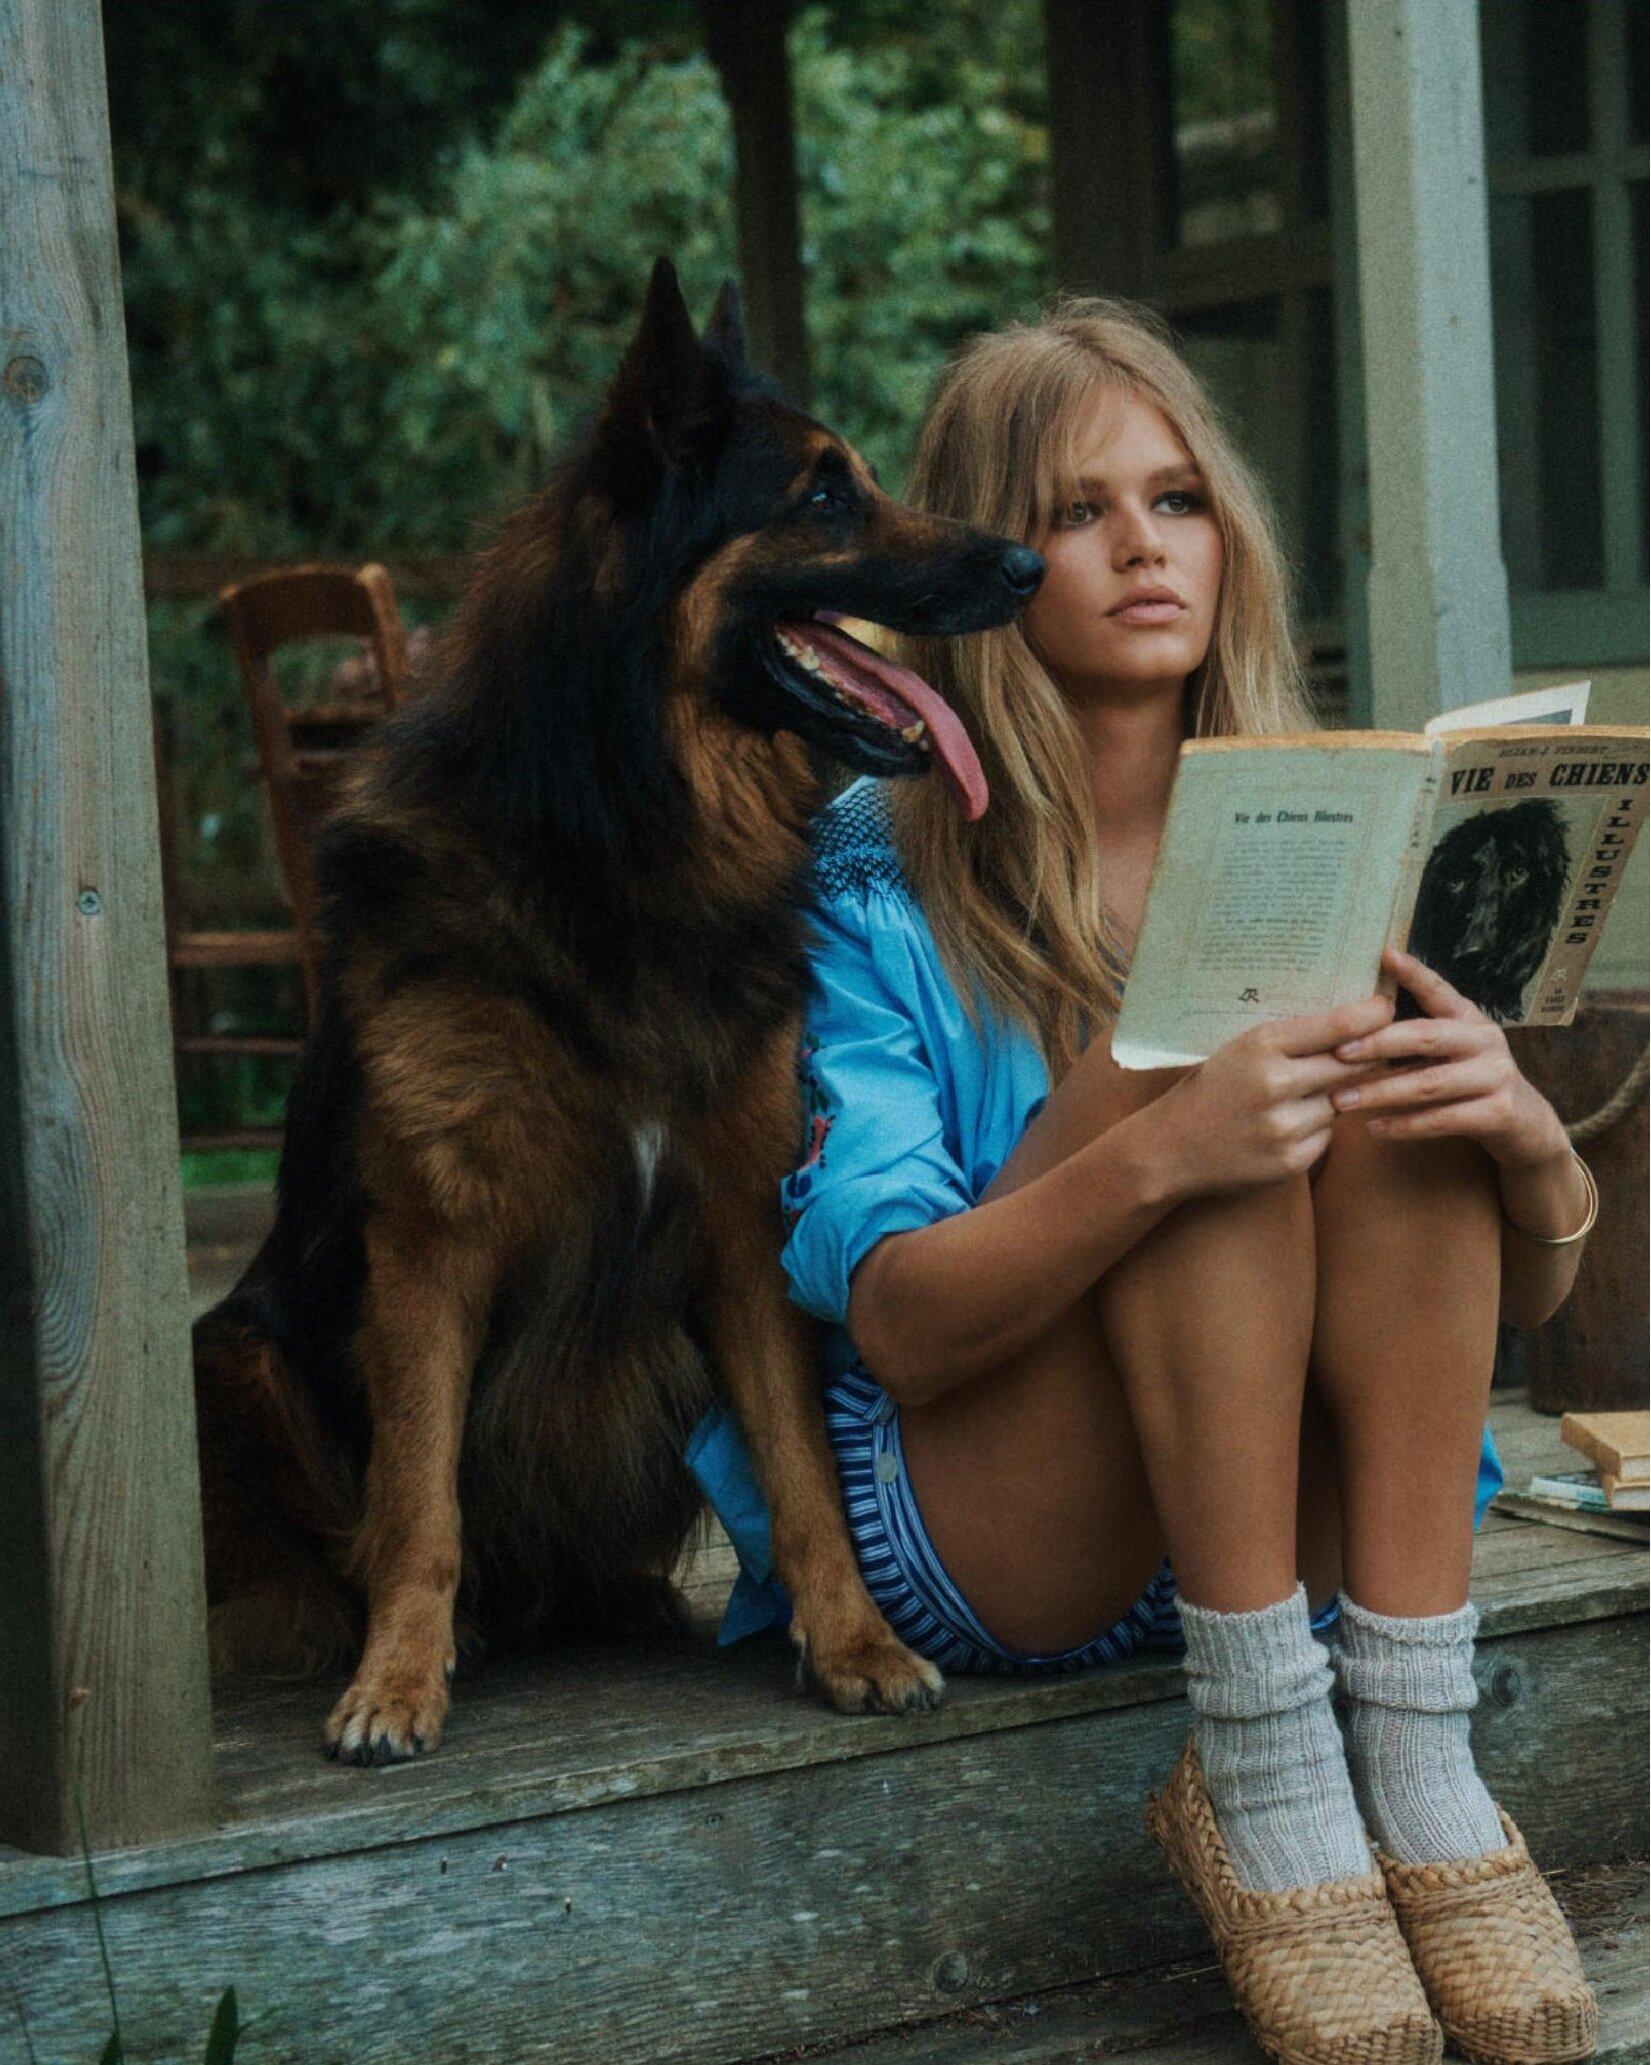 Anna Ewers by Lachlan Bailey for Vogue Paris Nov 2019 (6).jpg